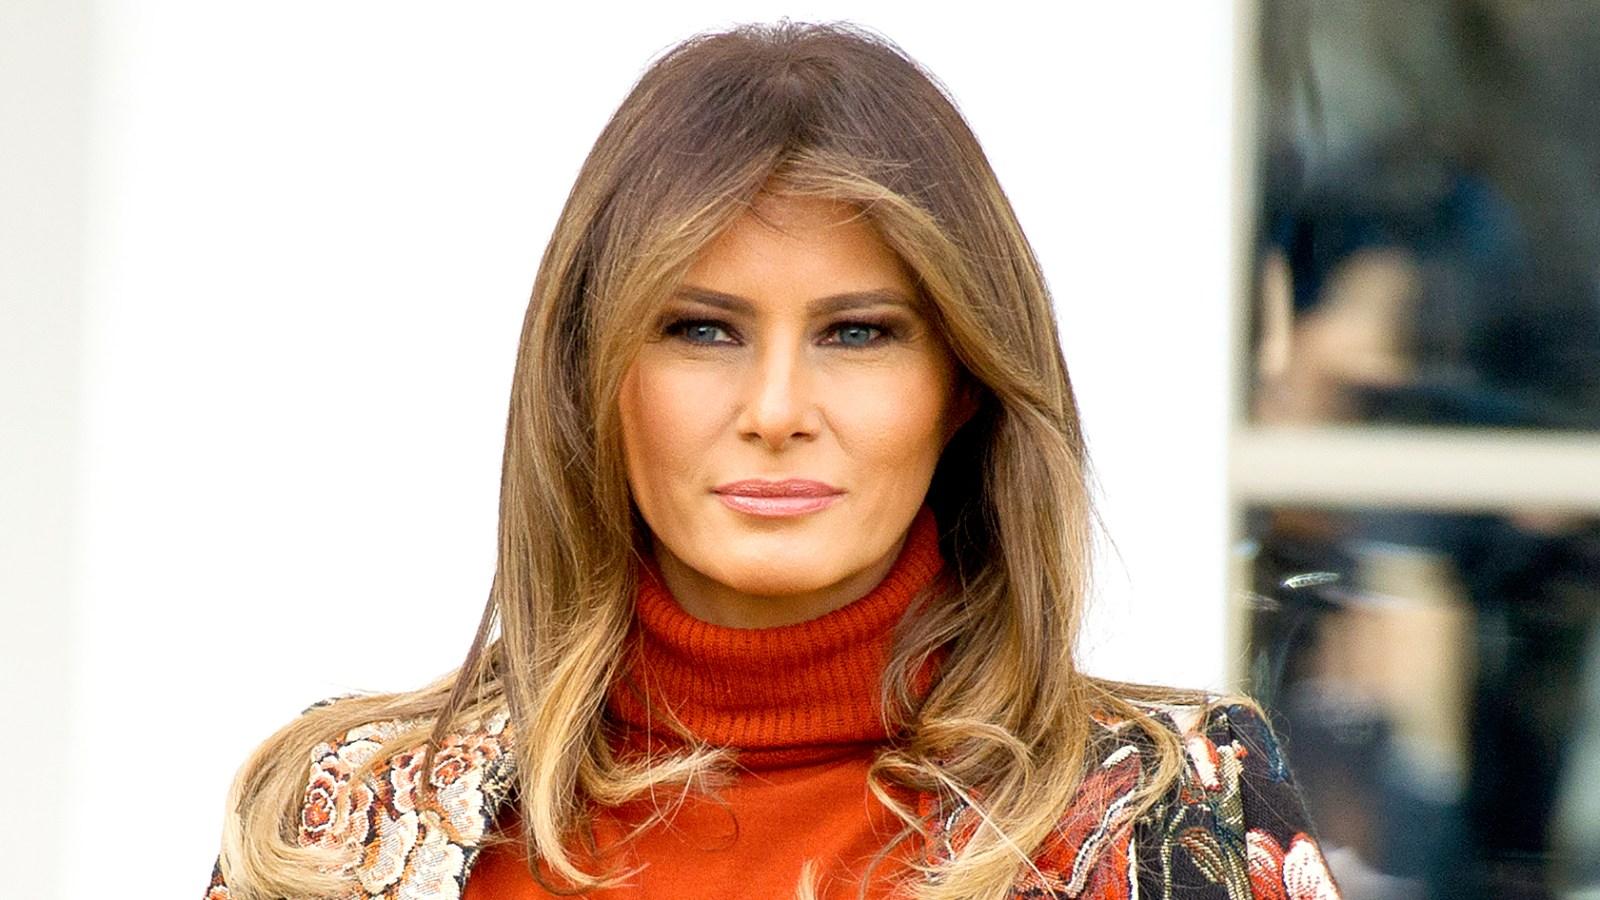 Melania Trump Hd Wallpaper - Thitknithtcom-6615